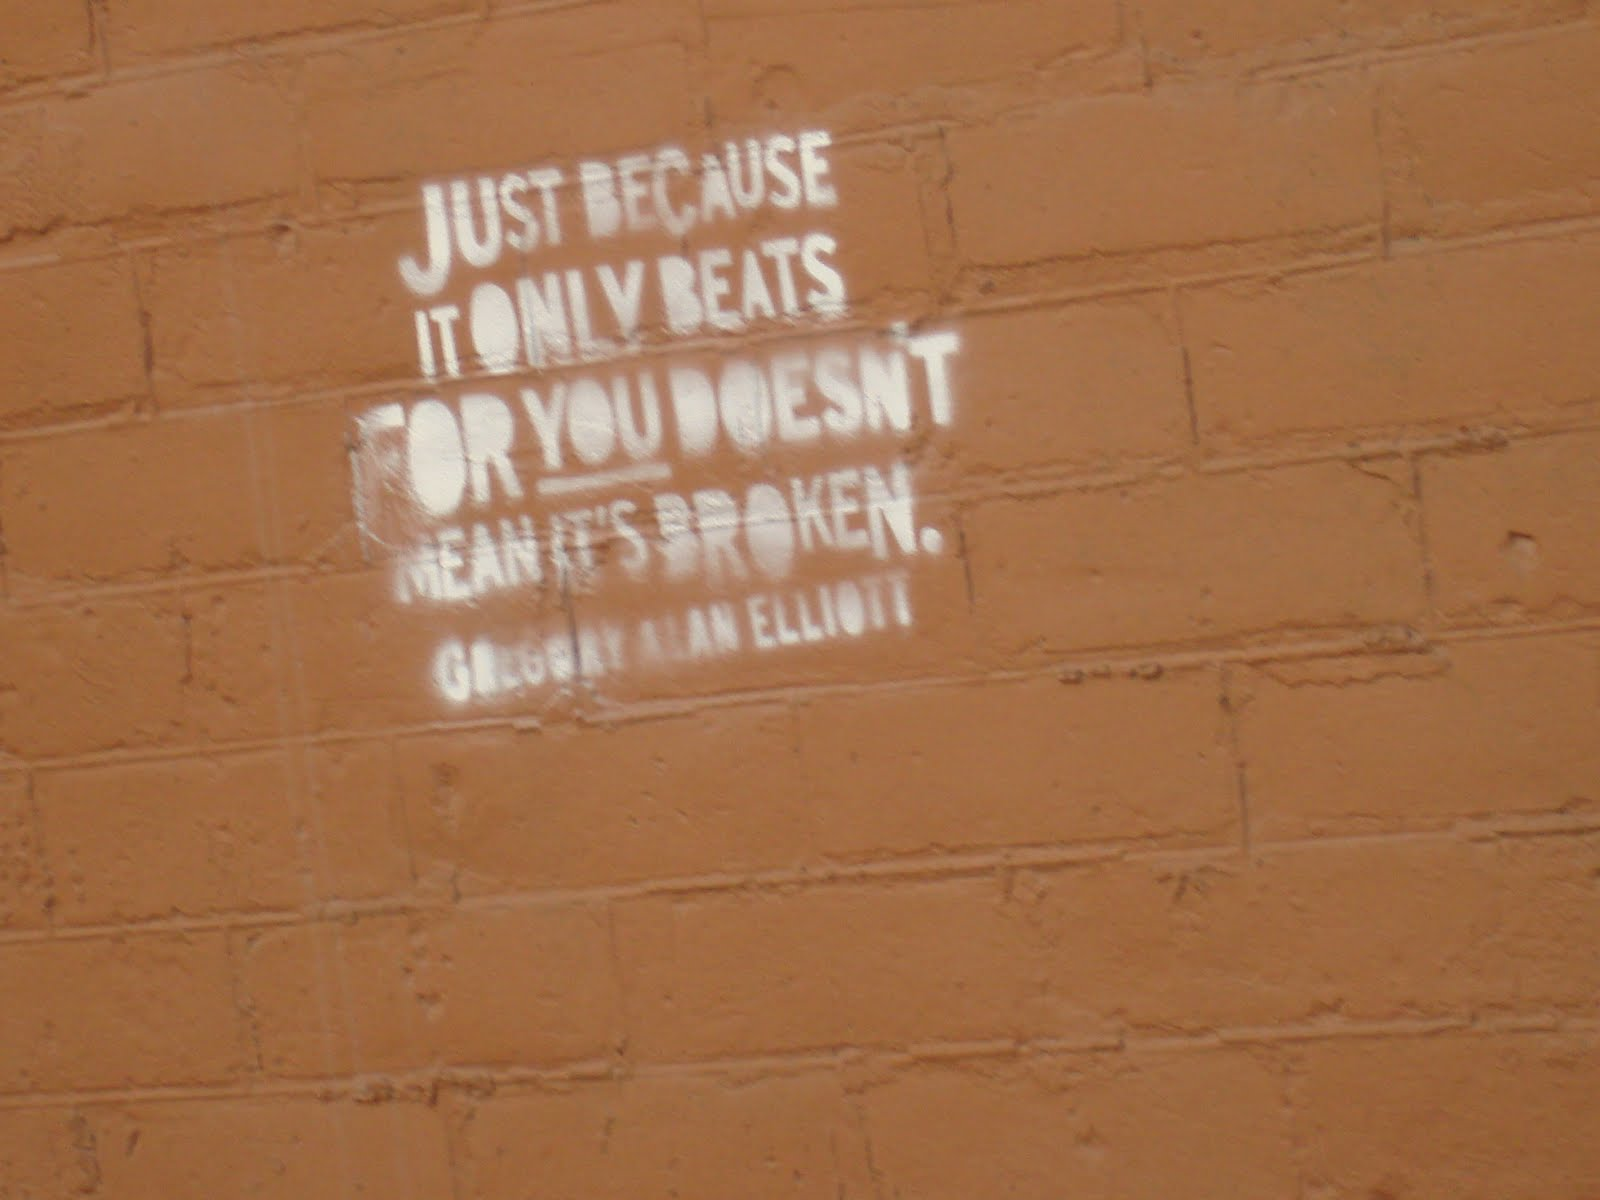 Kina Grannis's quote #6